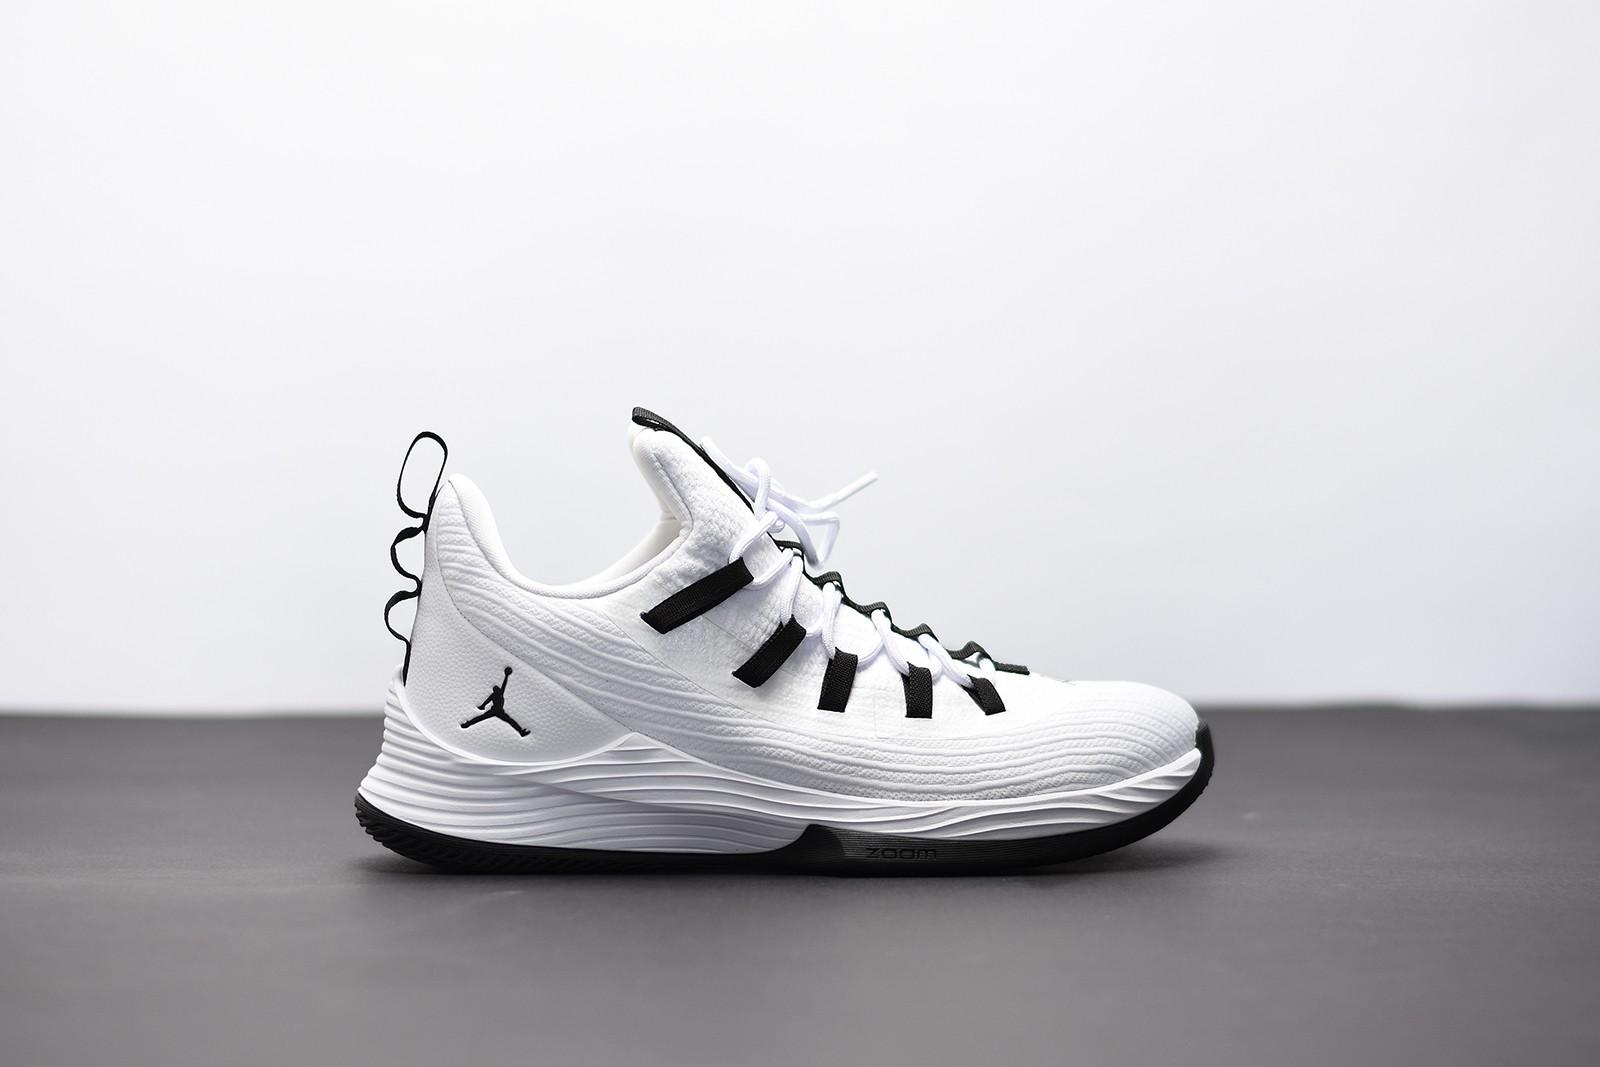 Pánské basketbalové Boty Jordan ULTRA FLY 2 LOW  dda6a3f17ab